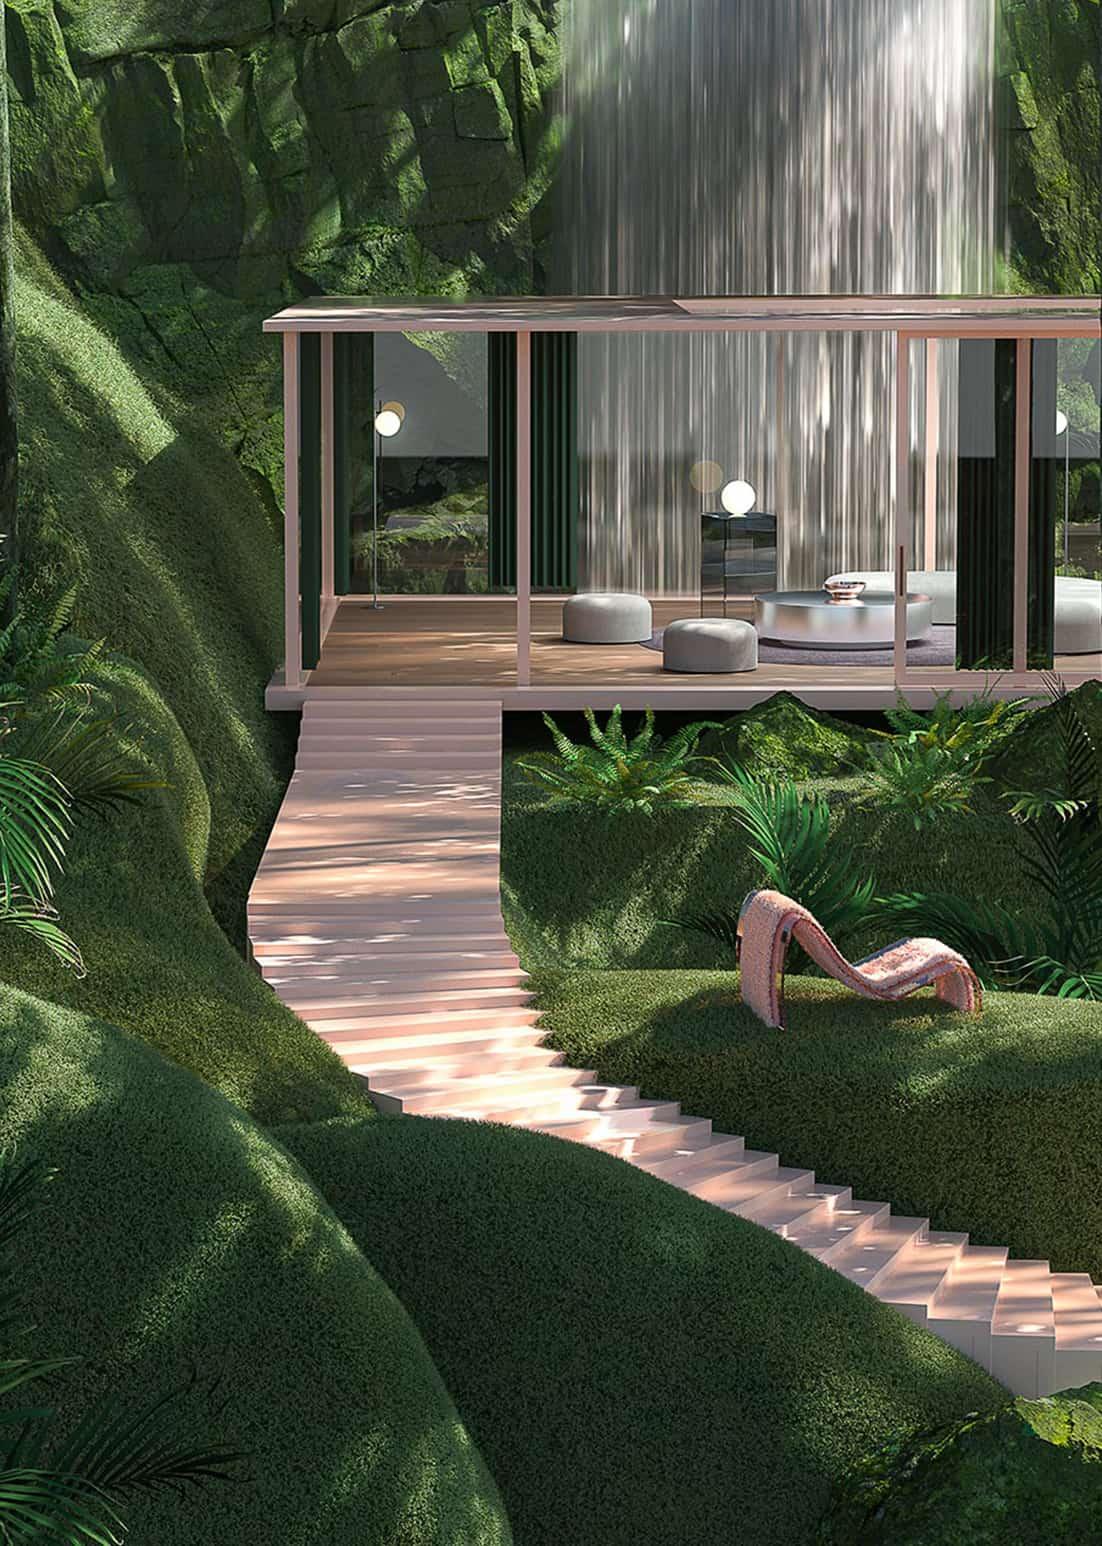 Loftgarten Grass House by Paul Milinski